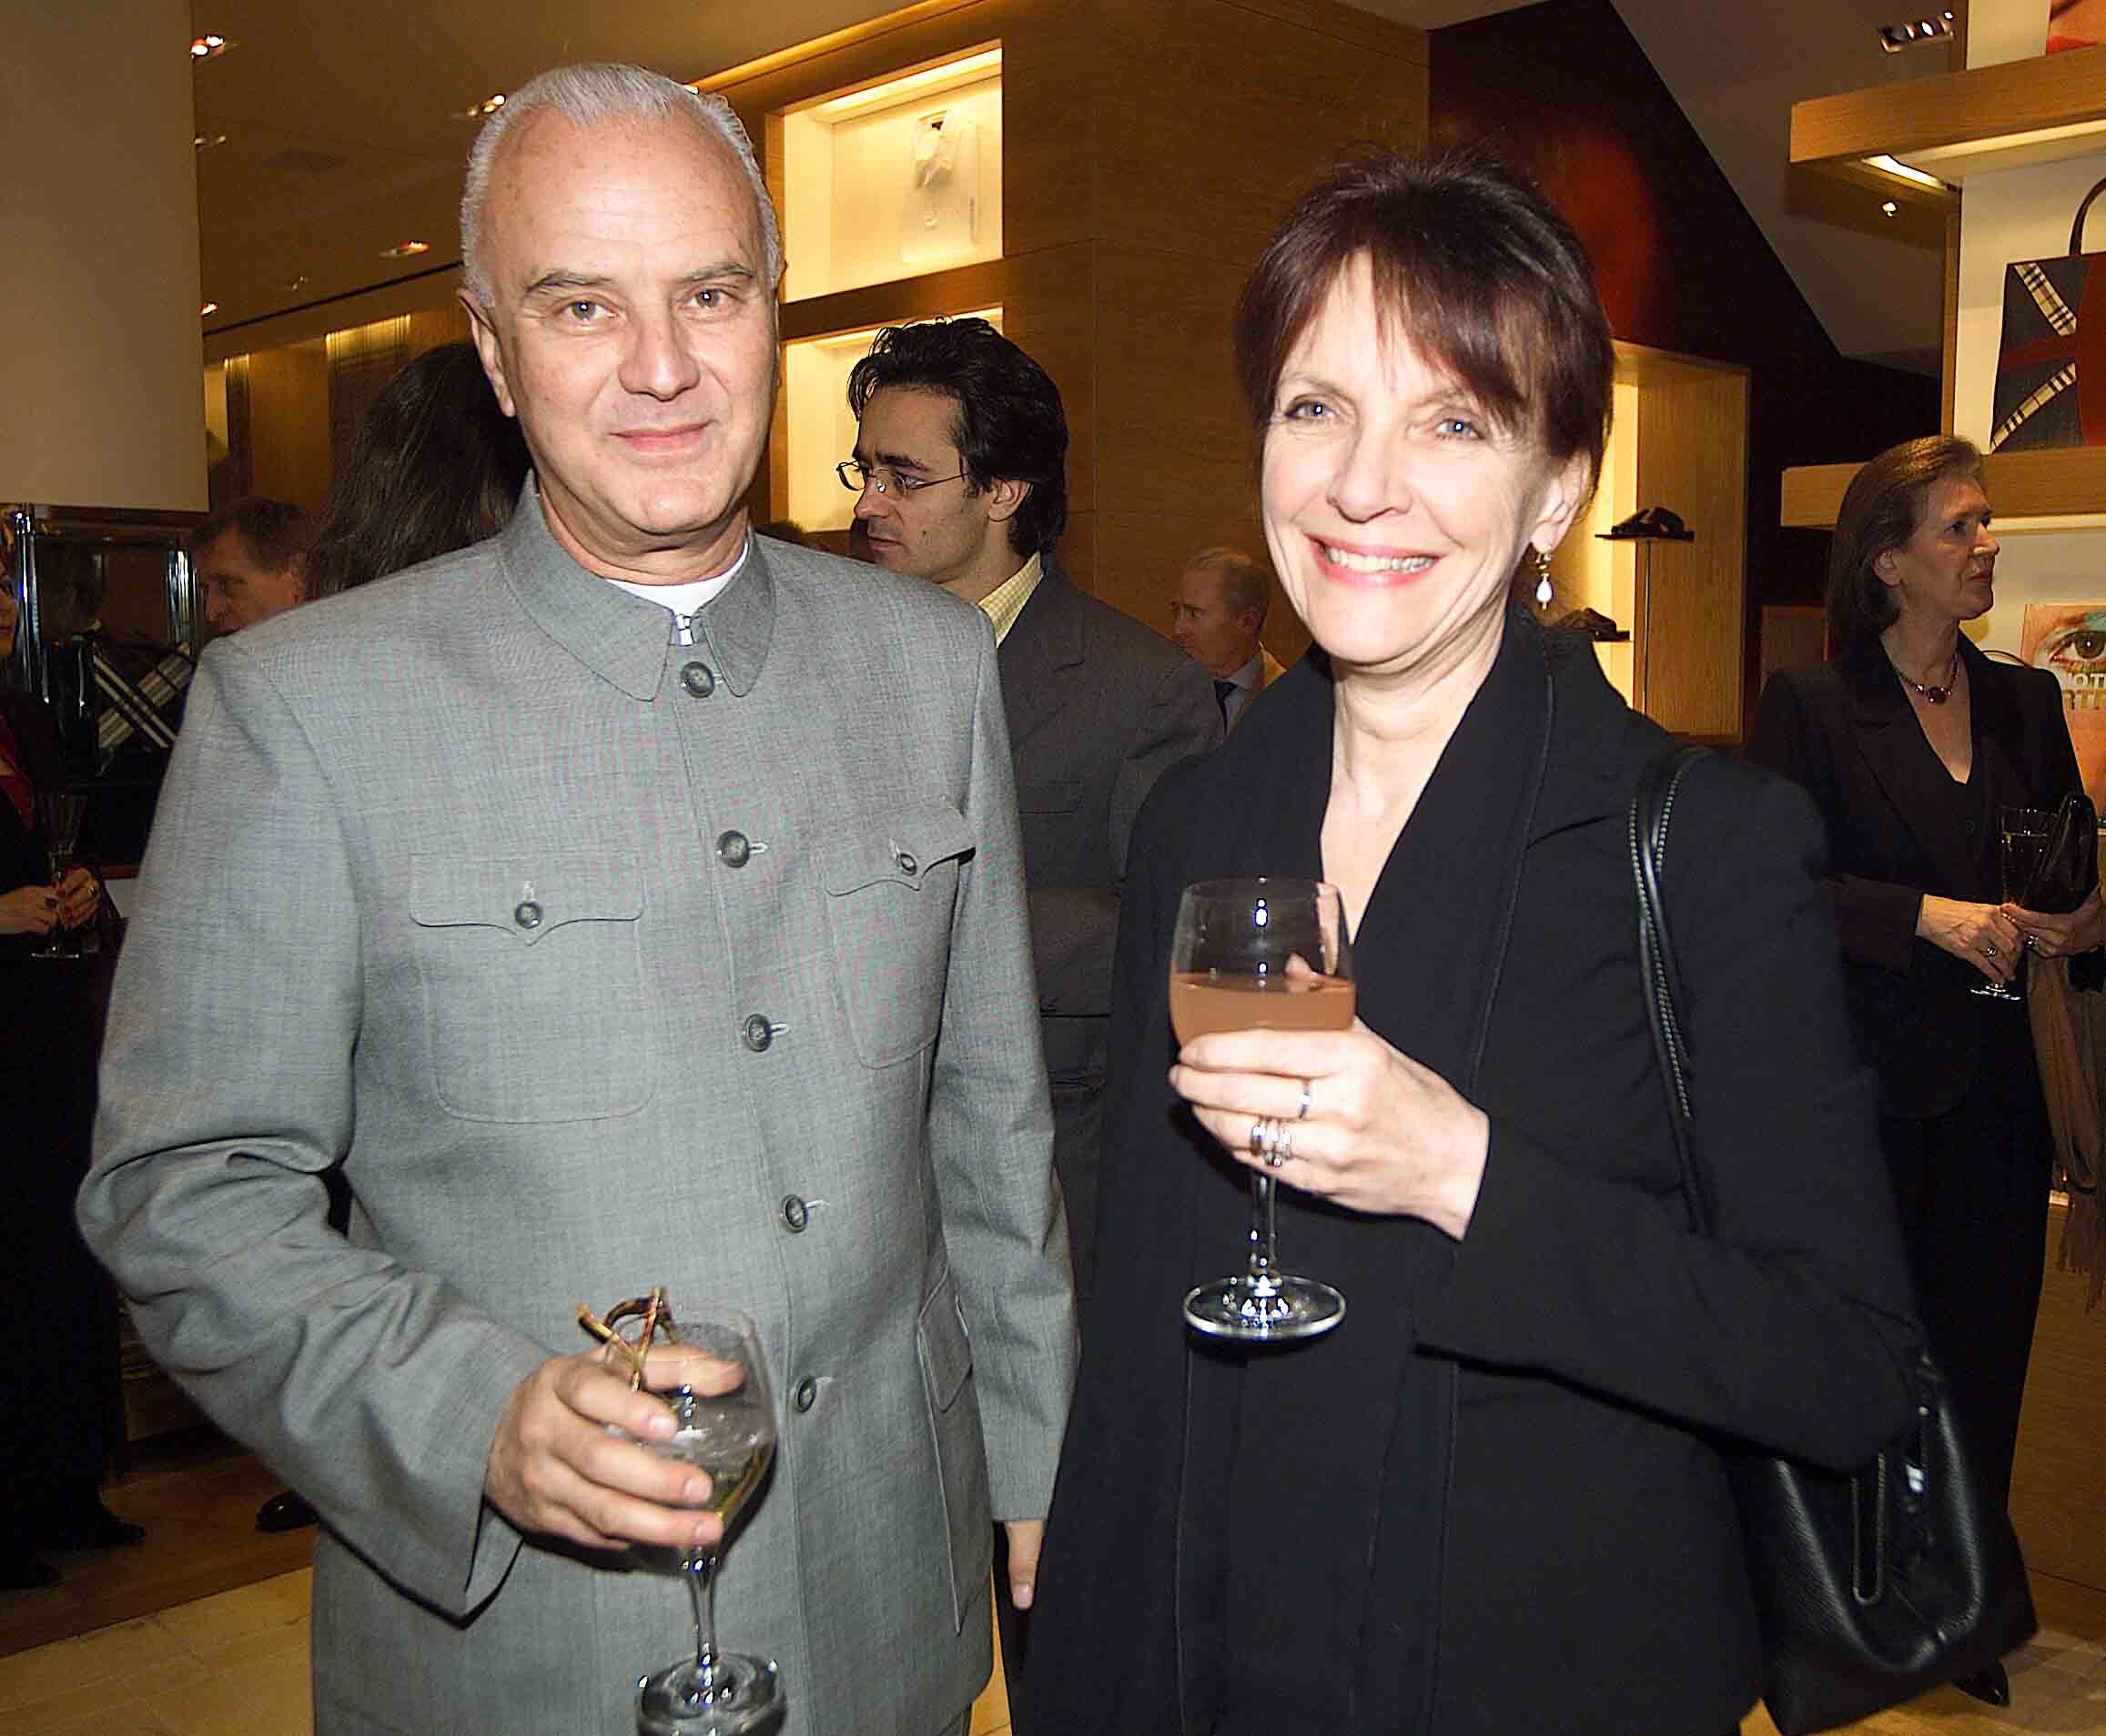 Manolo Blahnik and Anna Harvey